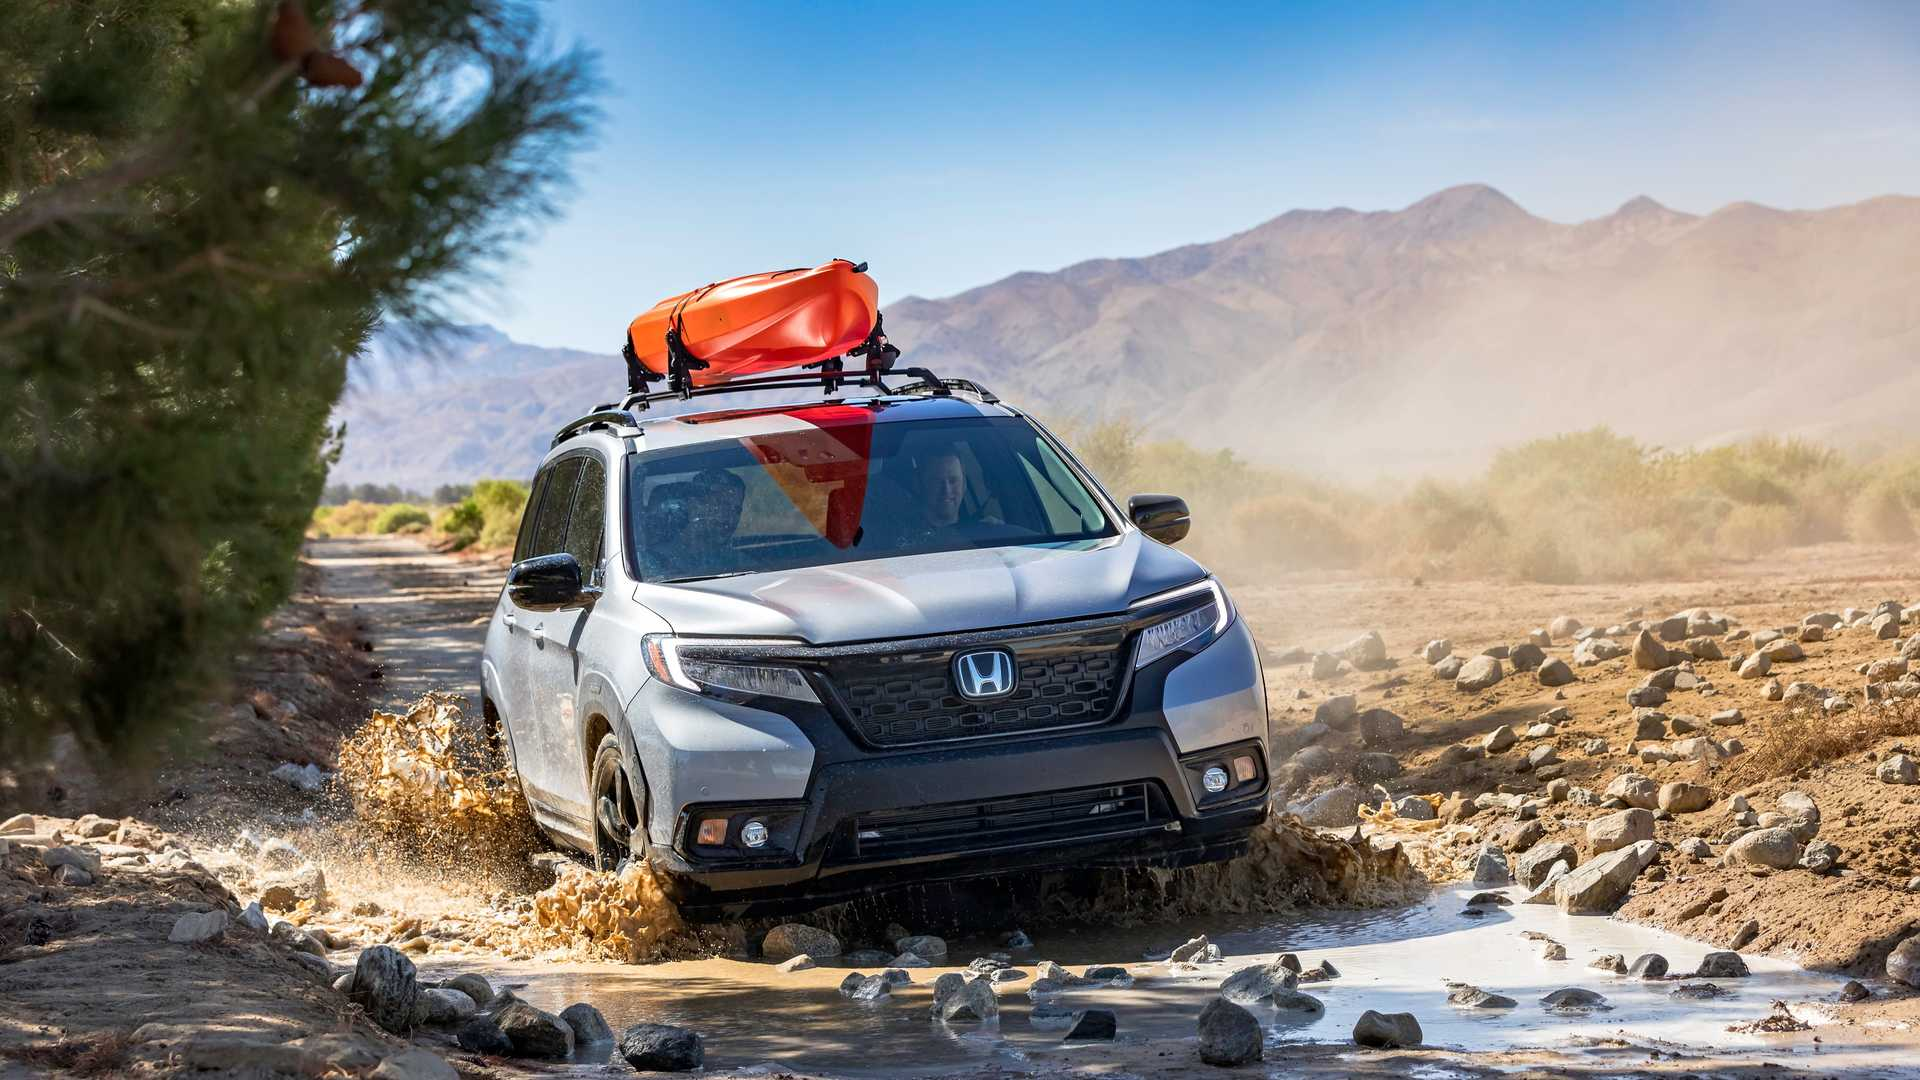 Honda'nın SUV'si Passport tanıtıldı